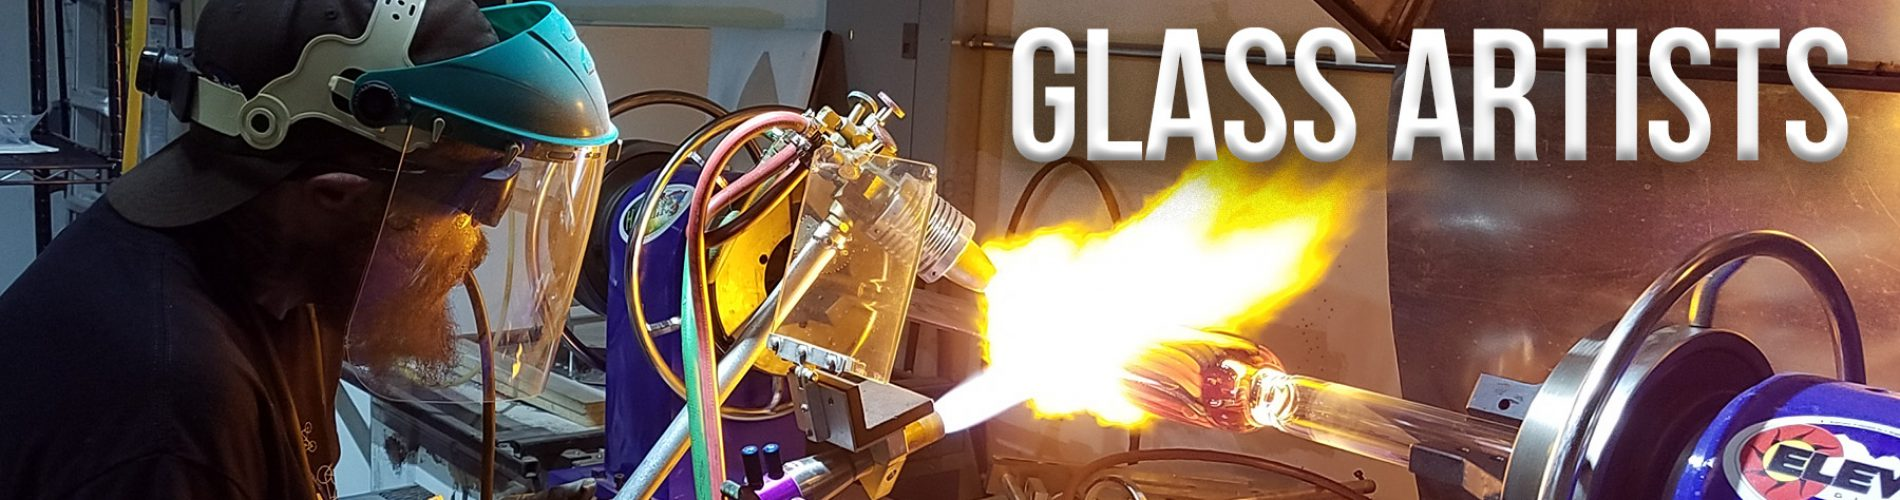 glass artists3